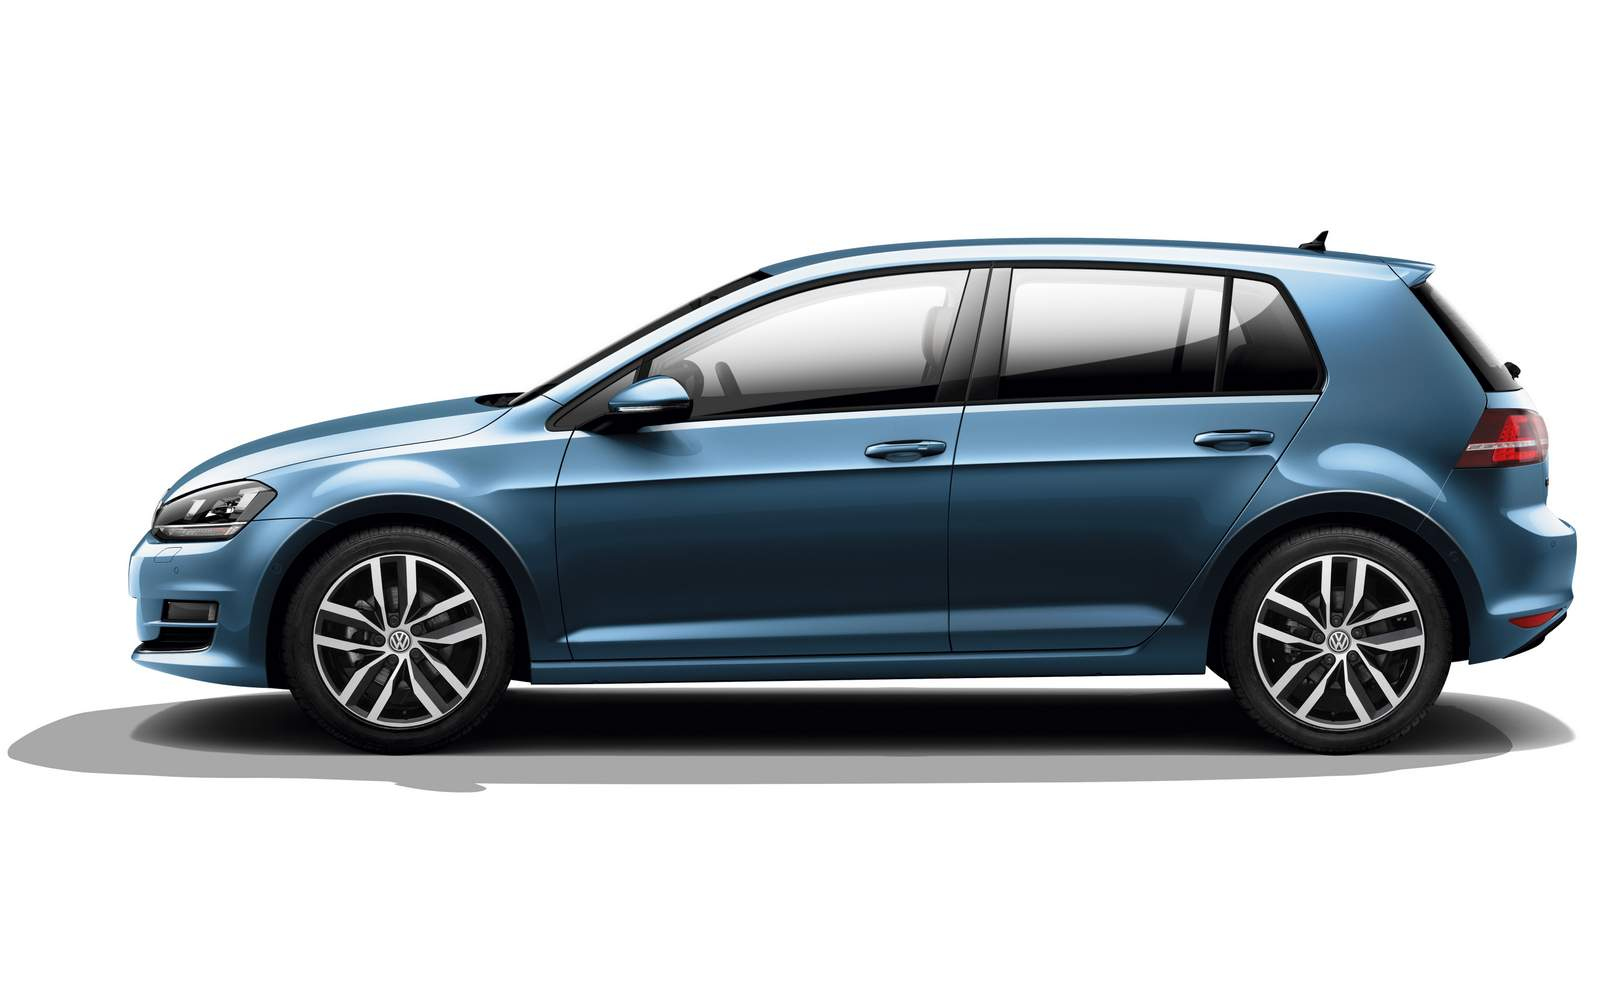 VW Golf 1.4 TSI DSG-7 - consumo